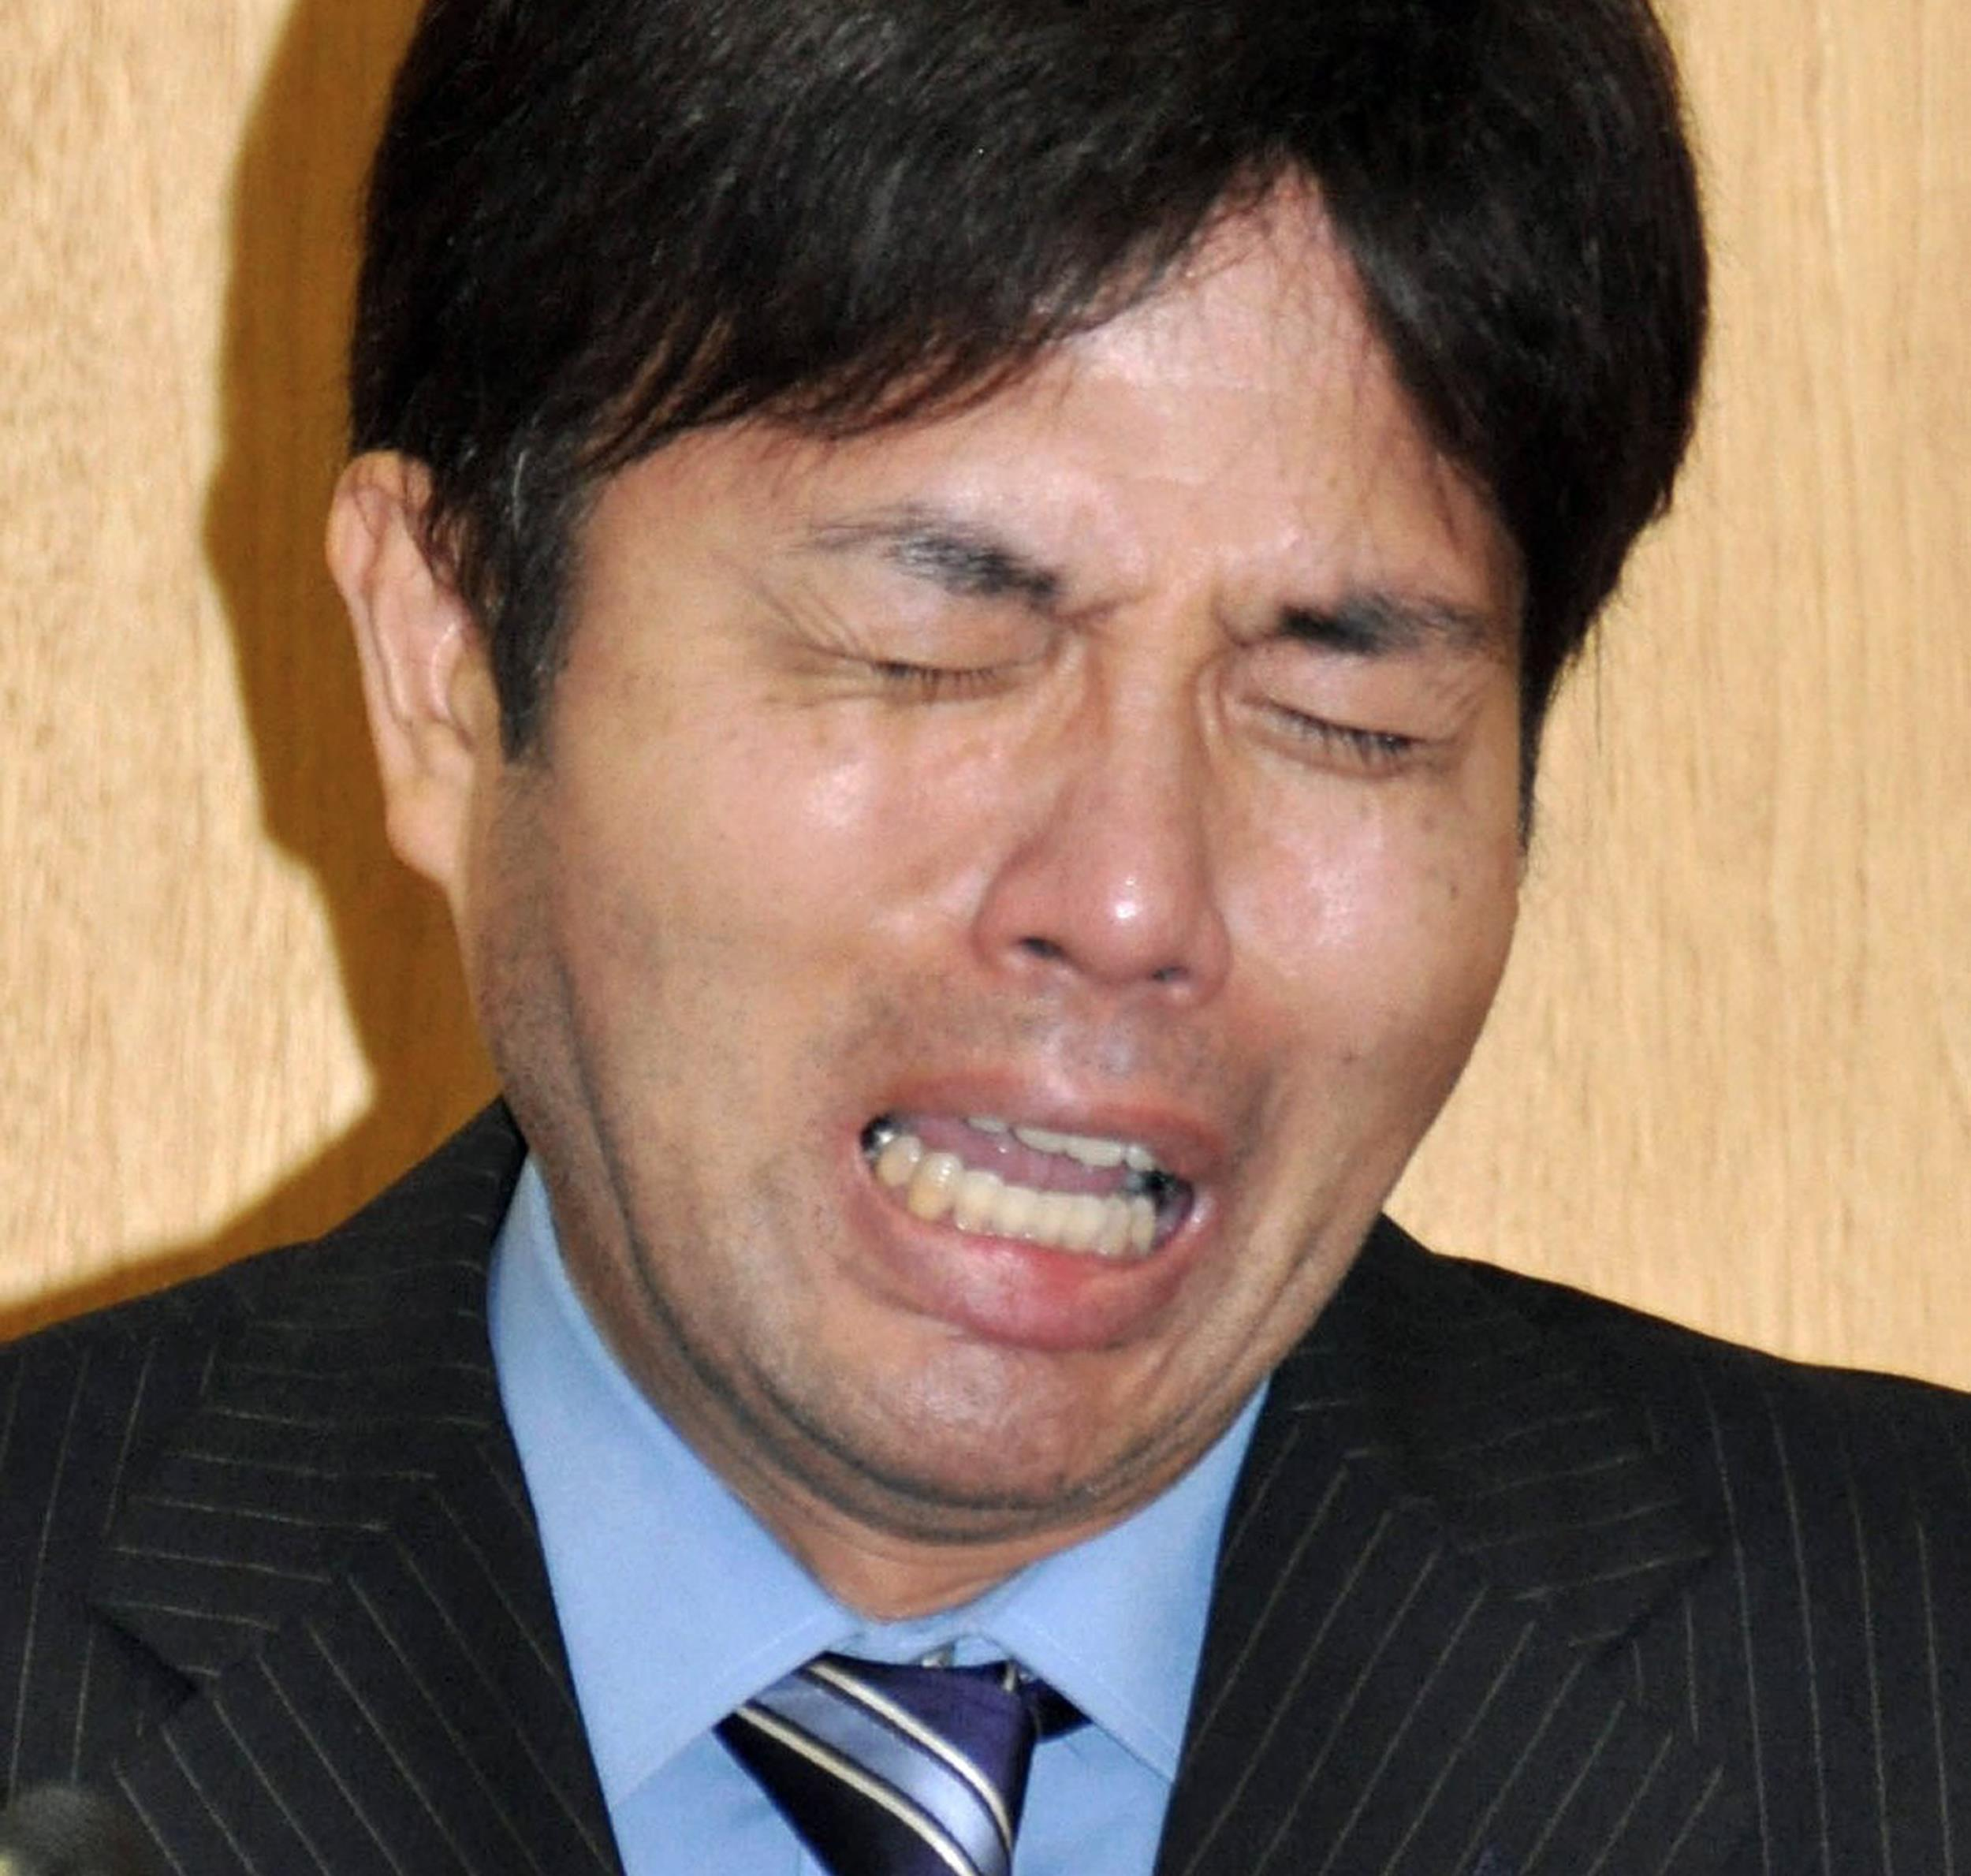 Image: Ryutaro Nonomura cries during a press conference in Kobe, western Japan.